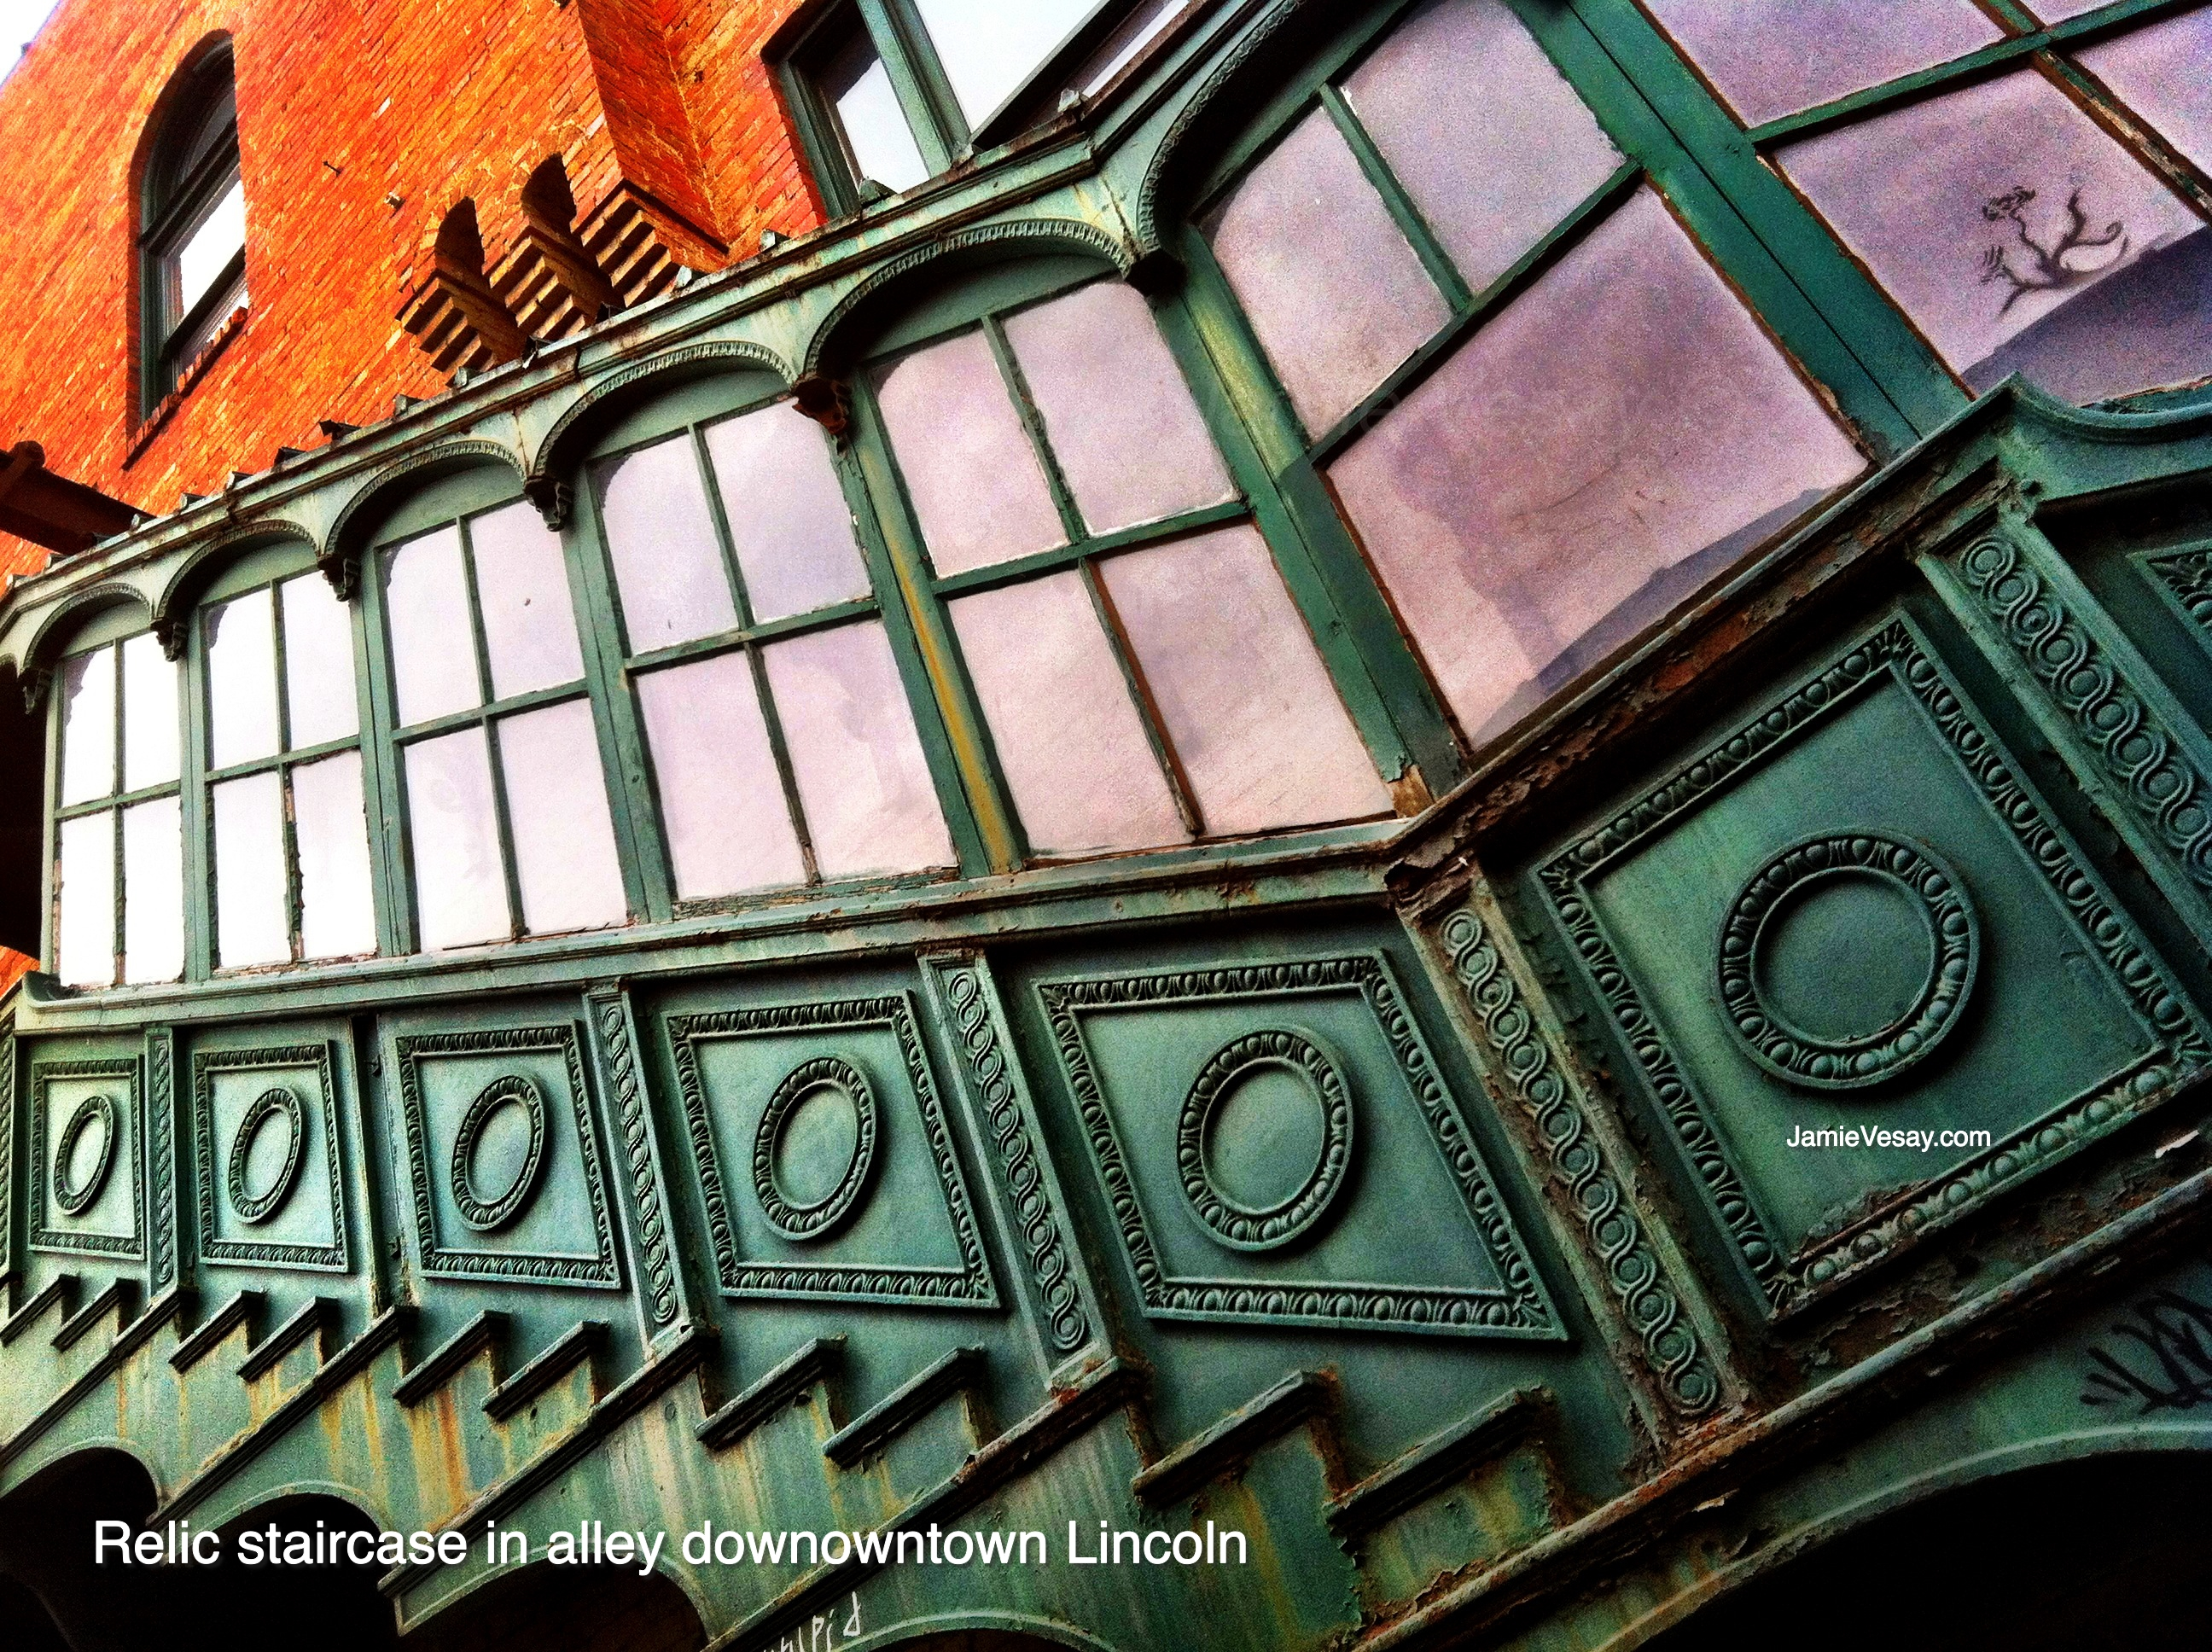 Lincoln encased staircase 2012 Jamie Vesay WM LBLD treated IMG_4846